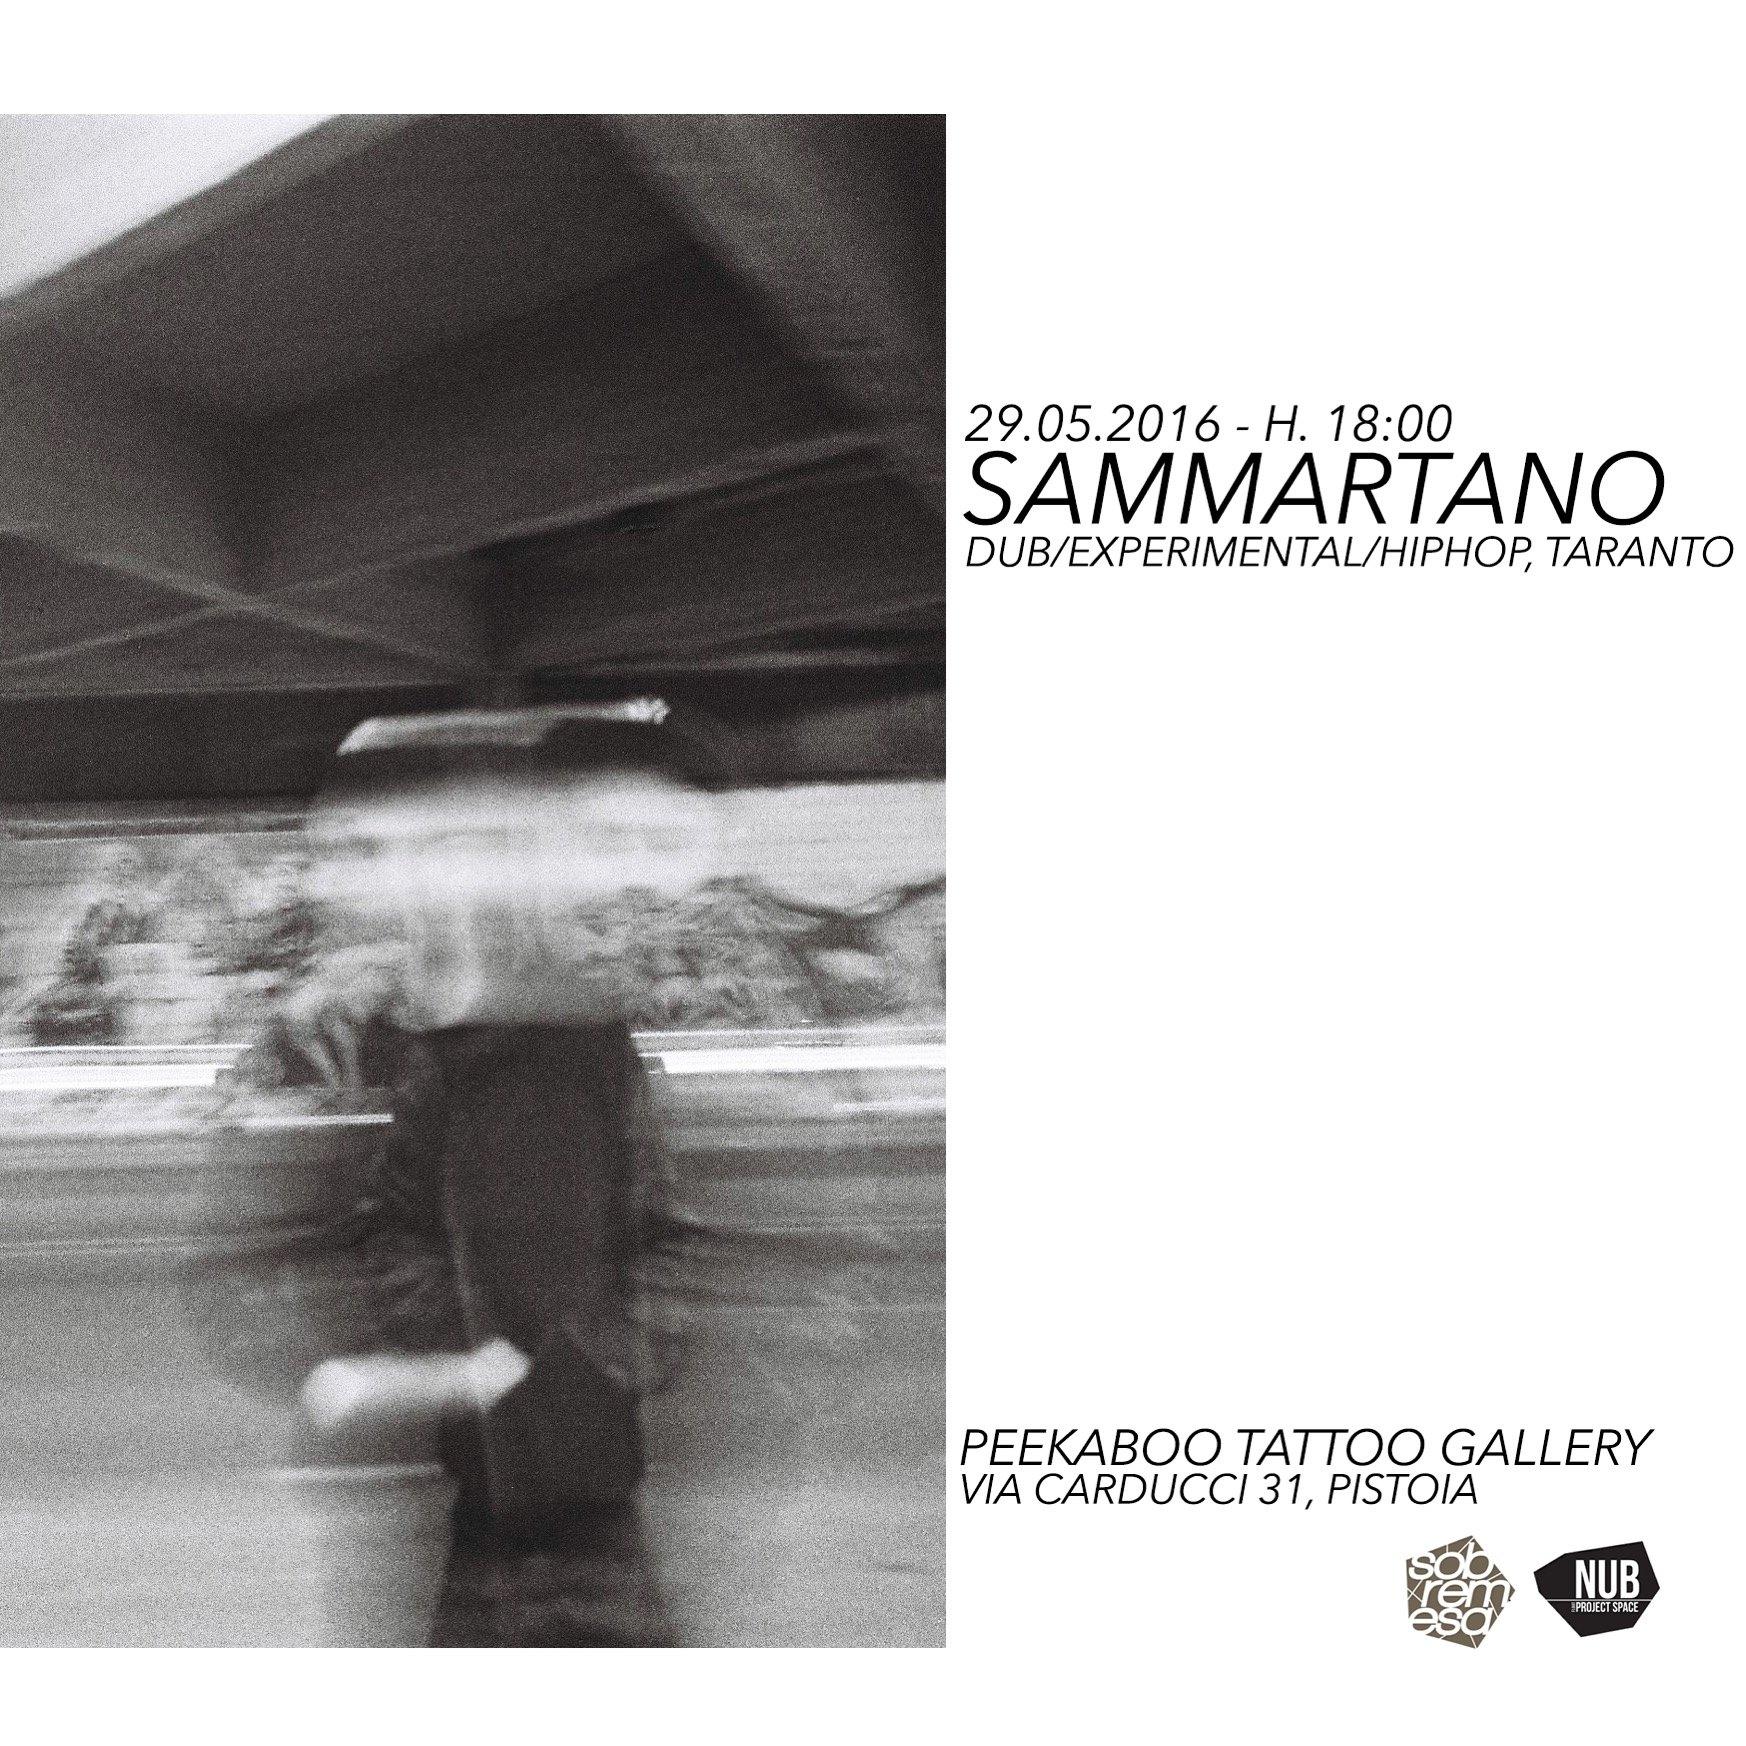 SAMMARTANO | 29.05.2016